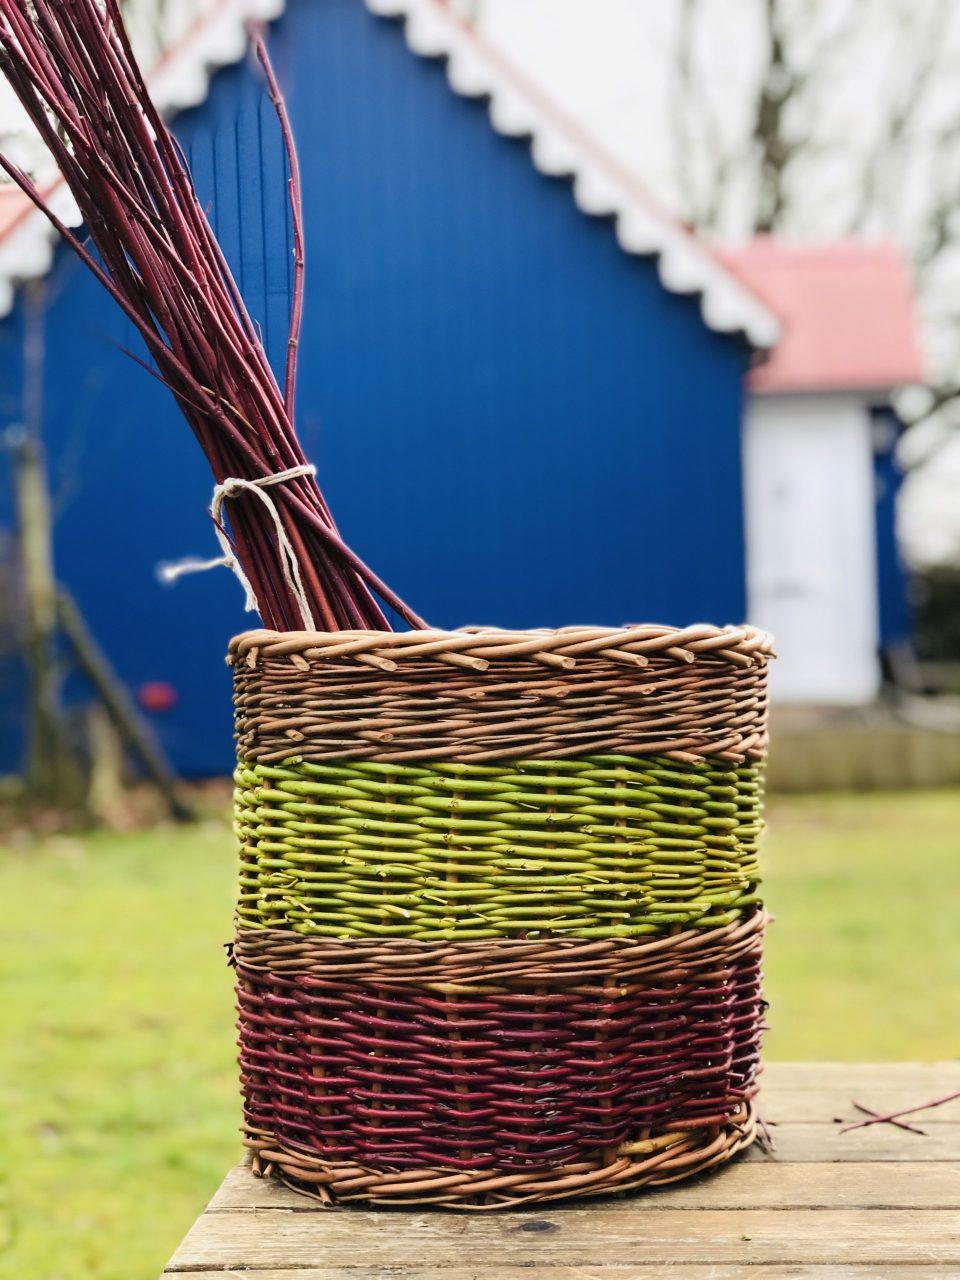 Baskets by Christiane Morley